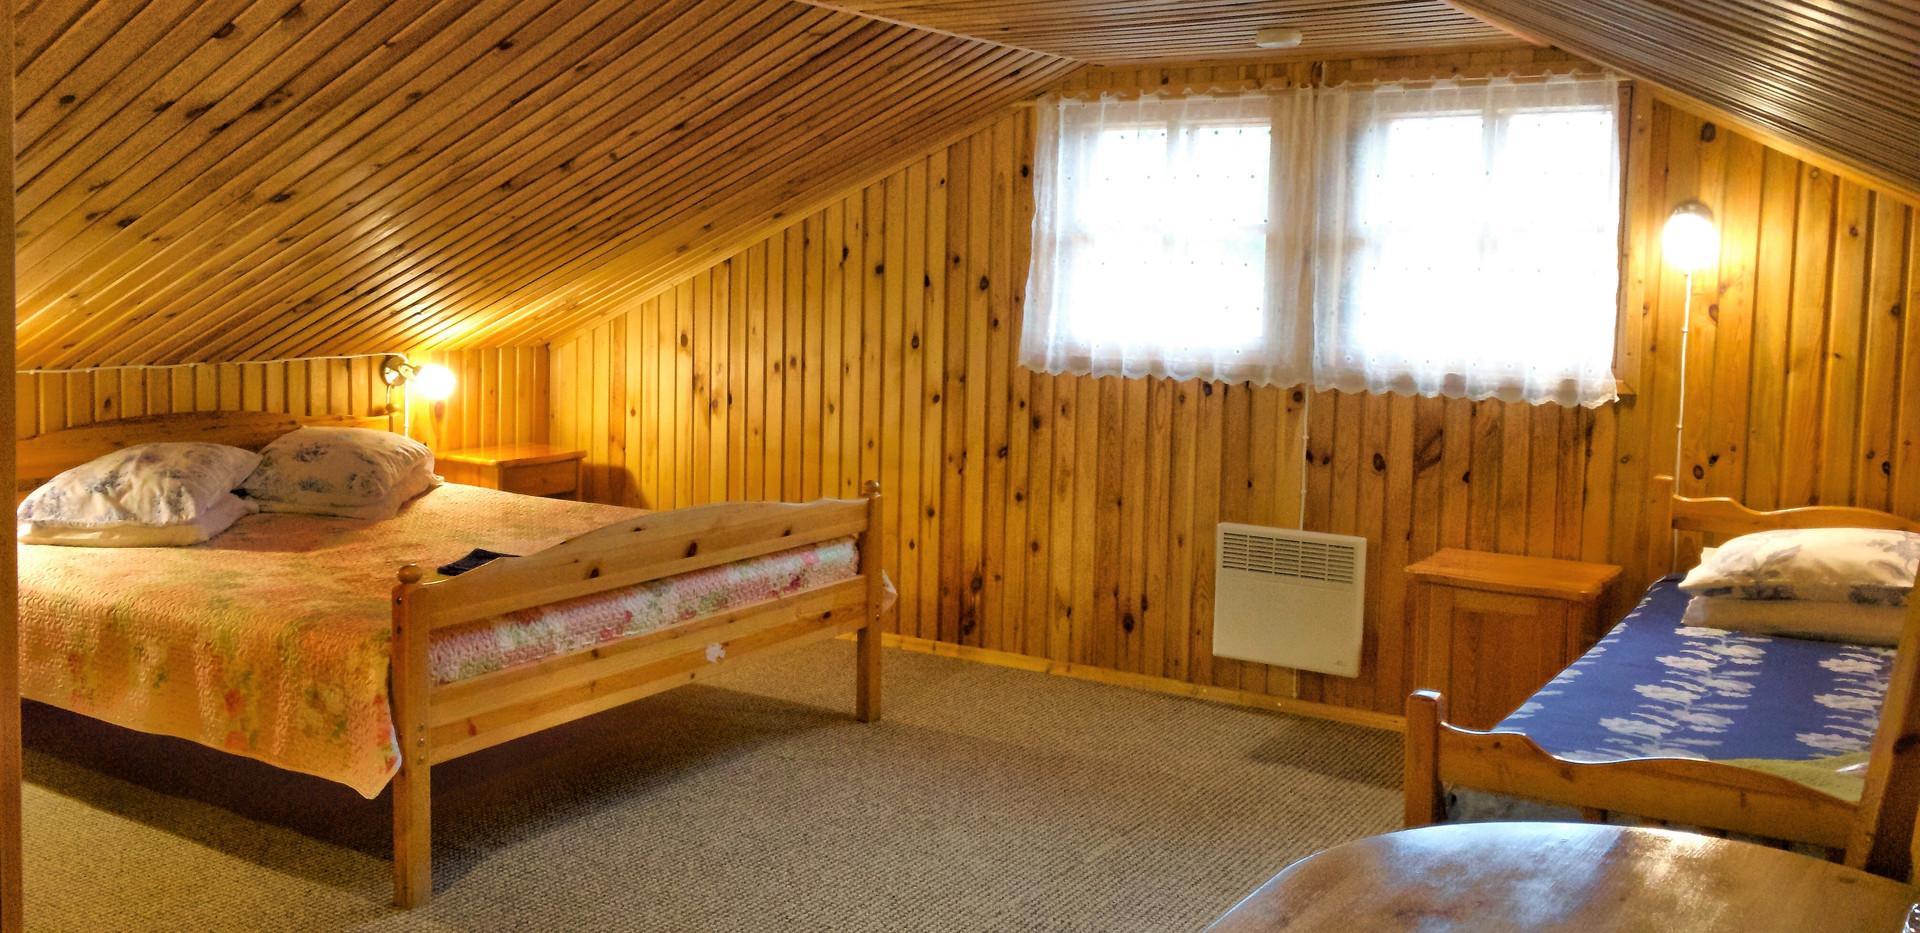 Tuba nr 4 - Külalistemaja Kikas